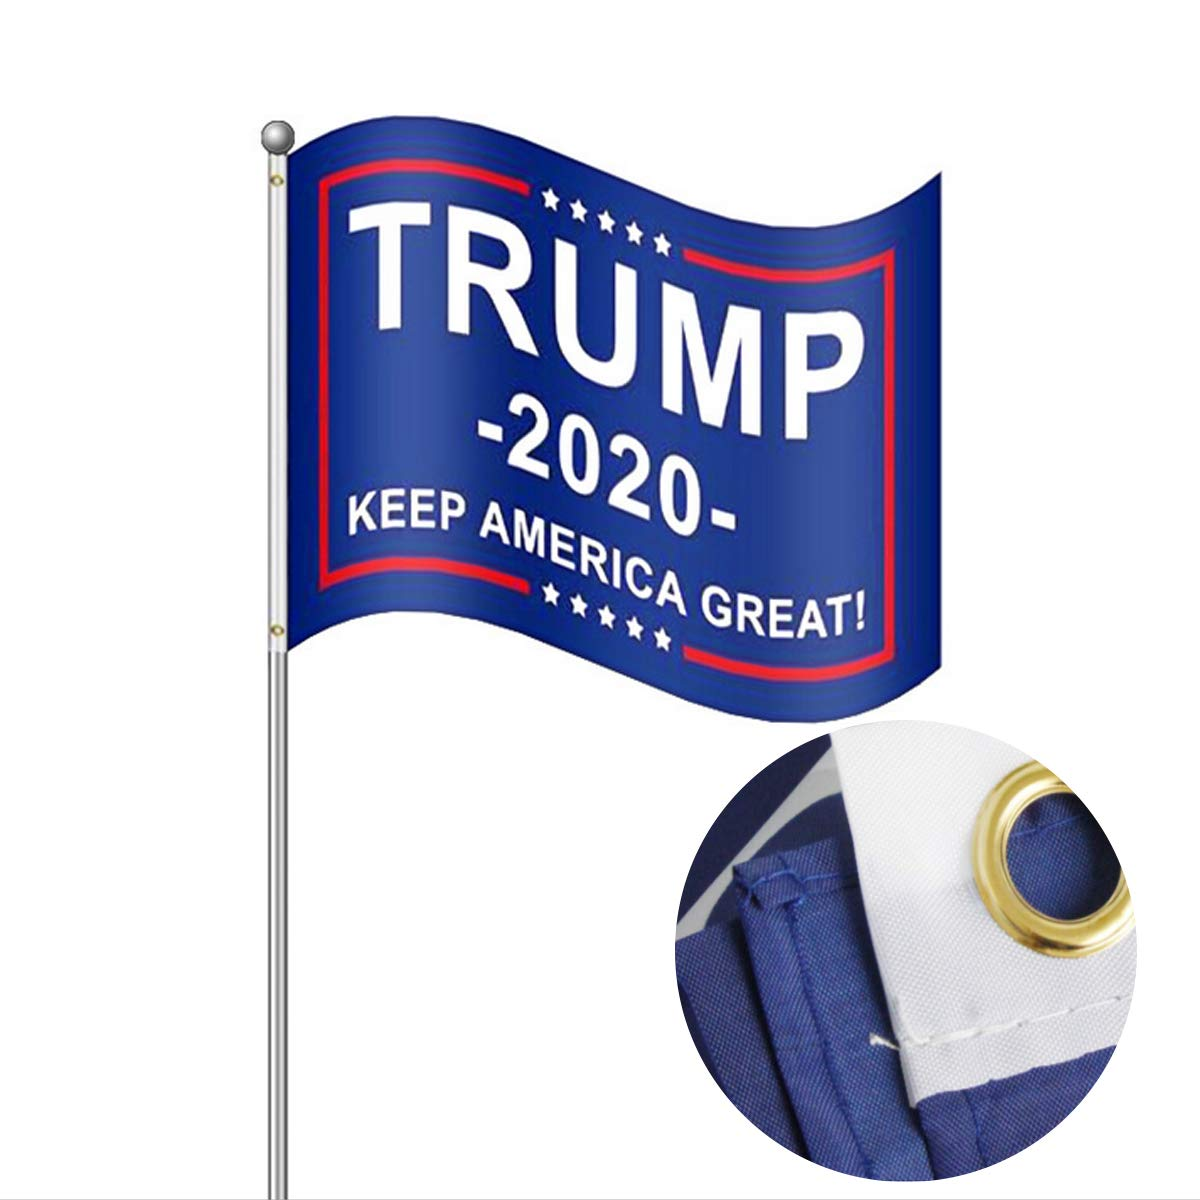 Amazon.com: Lita Donald Trump Flag 2020 Trump Keep America ...